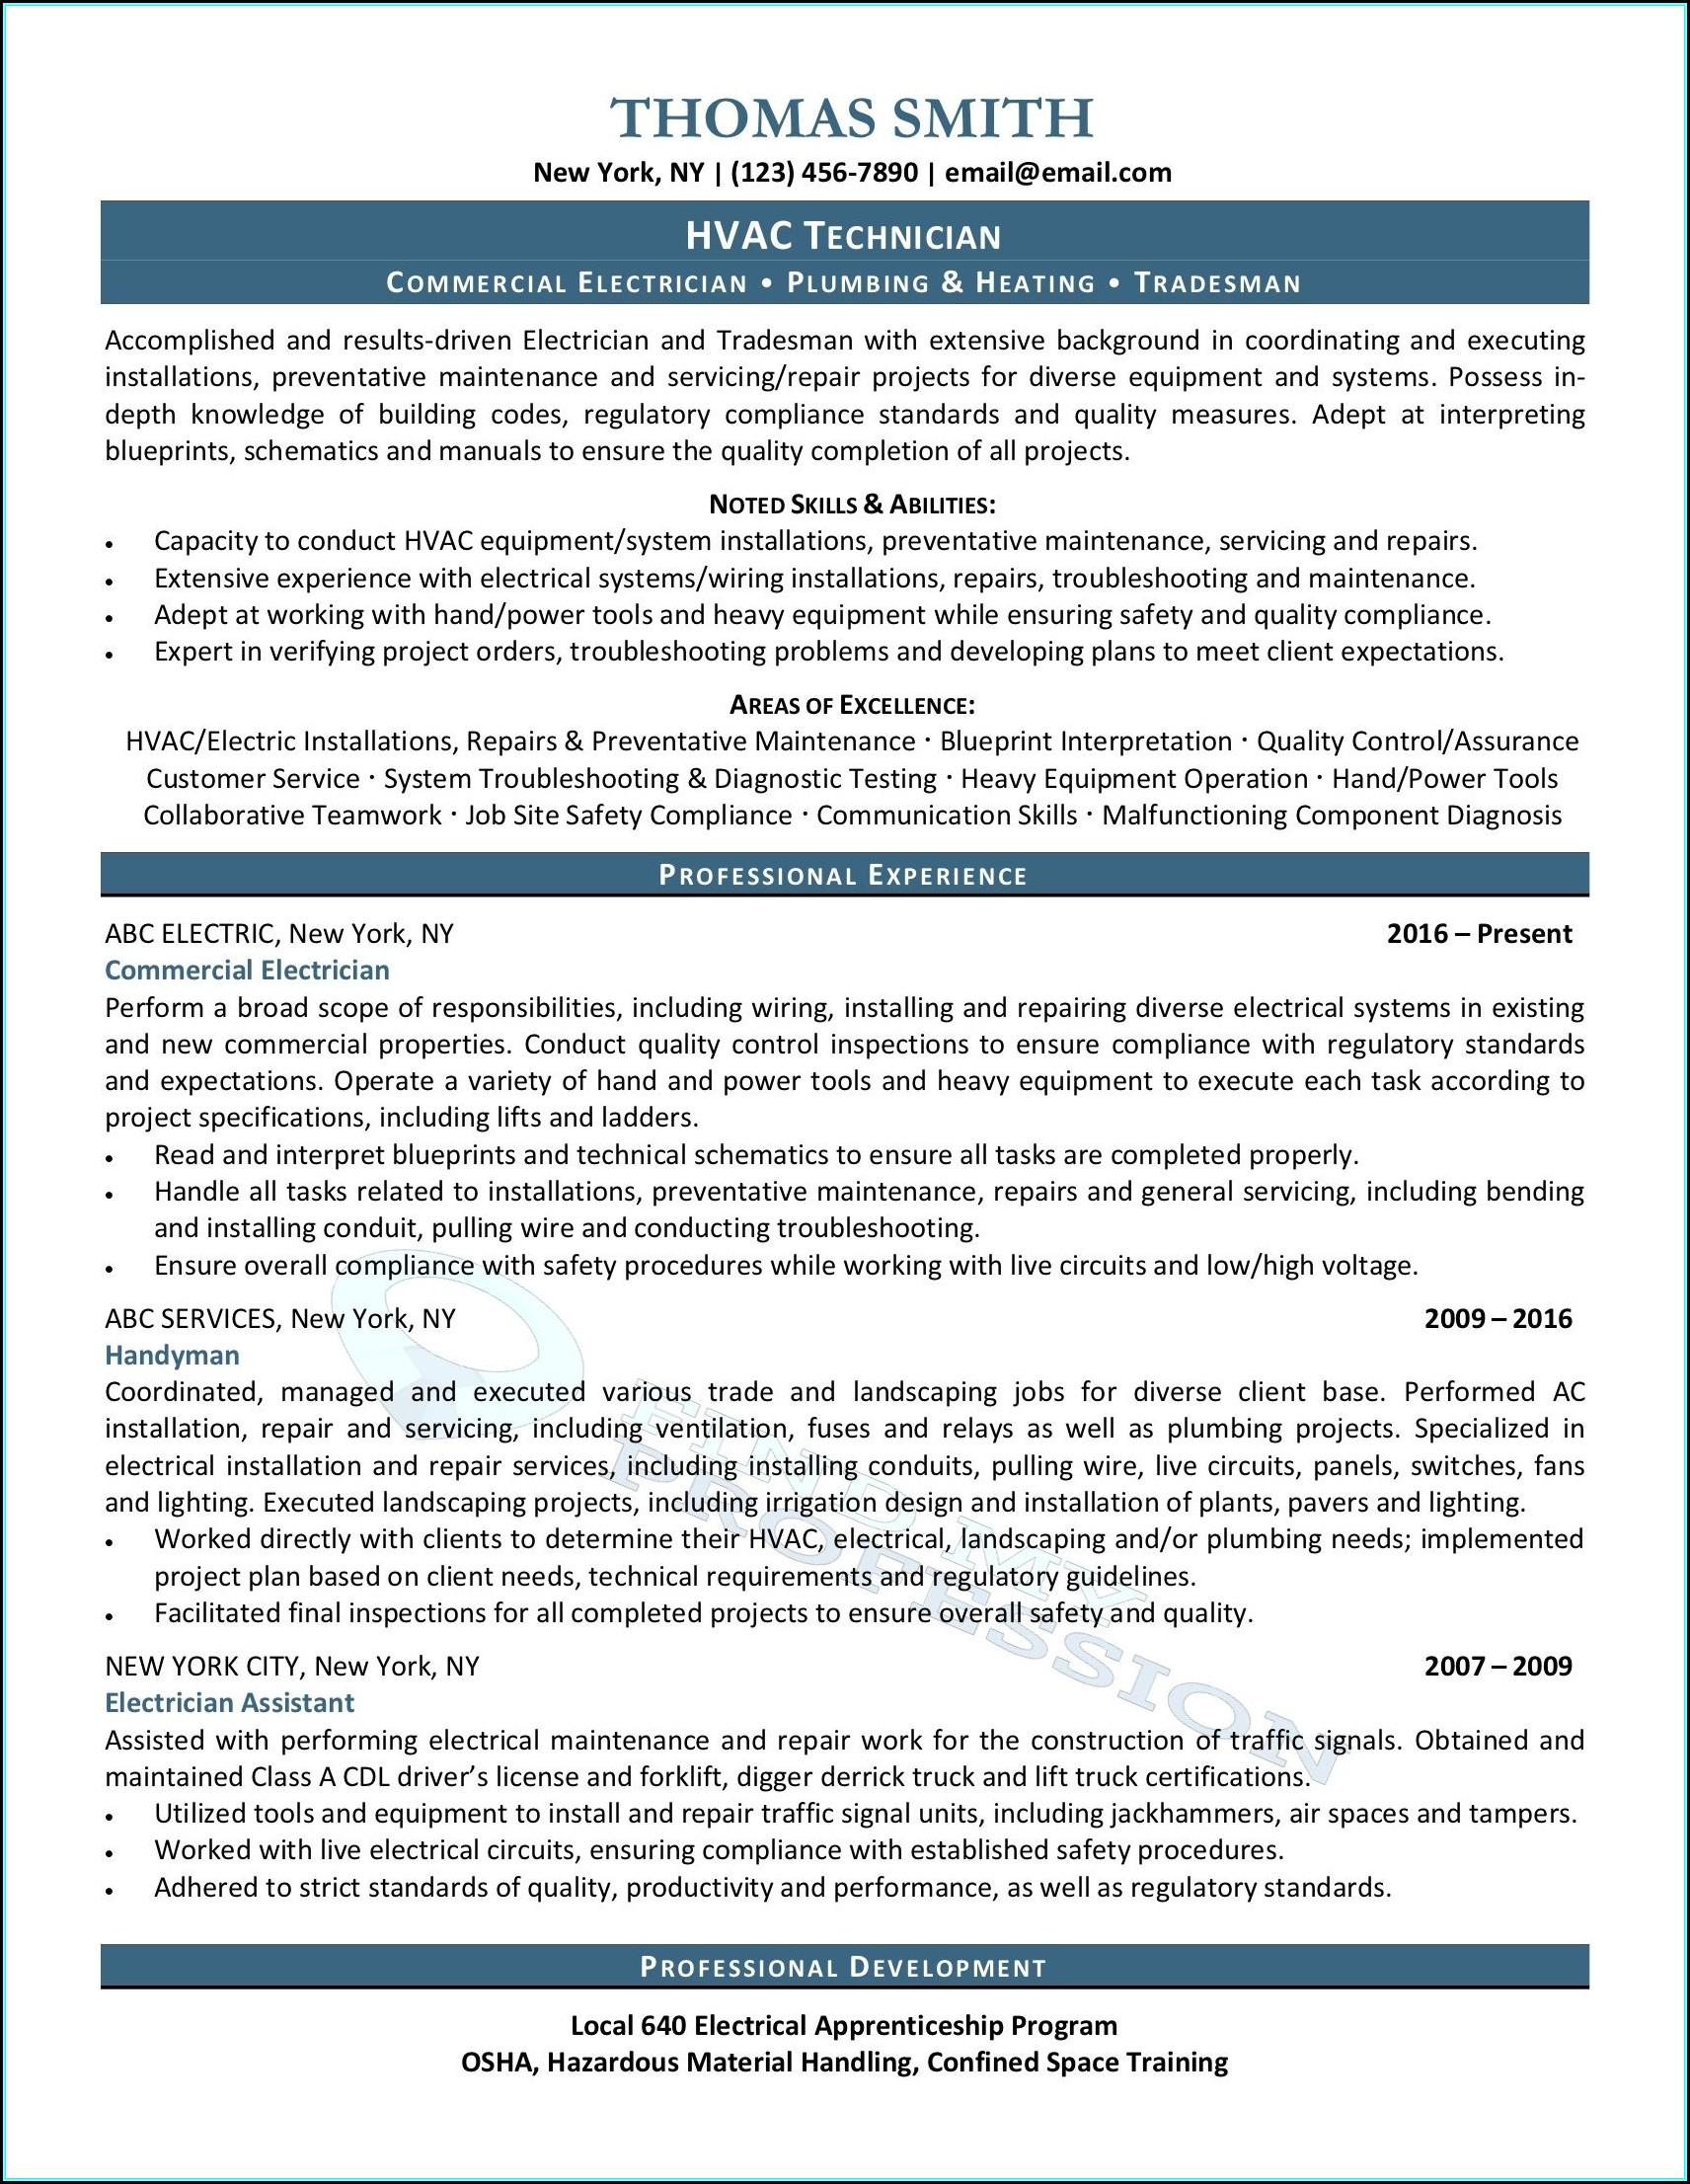 4+ HVAC Resume Templates - DOC, PDF | Free & Premium Templates